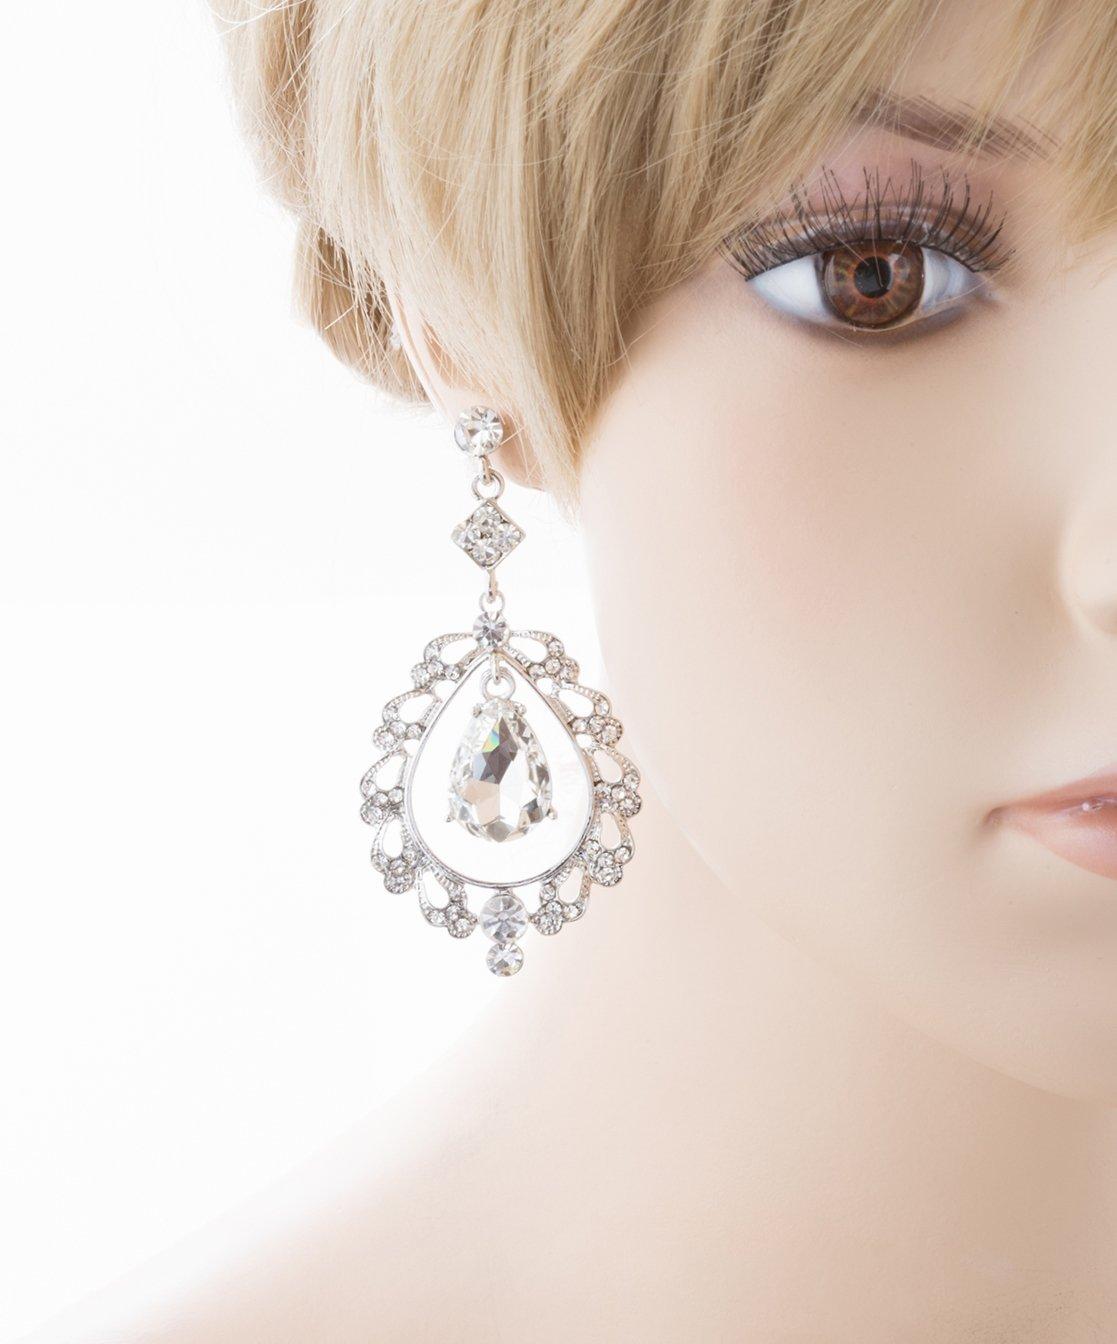 Bridal Wedding Crystal Rhinestone Teardrop Open Dangling Drop Fashion Earrings by Accessoriesforever (Image #2)